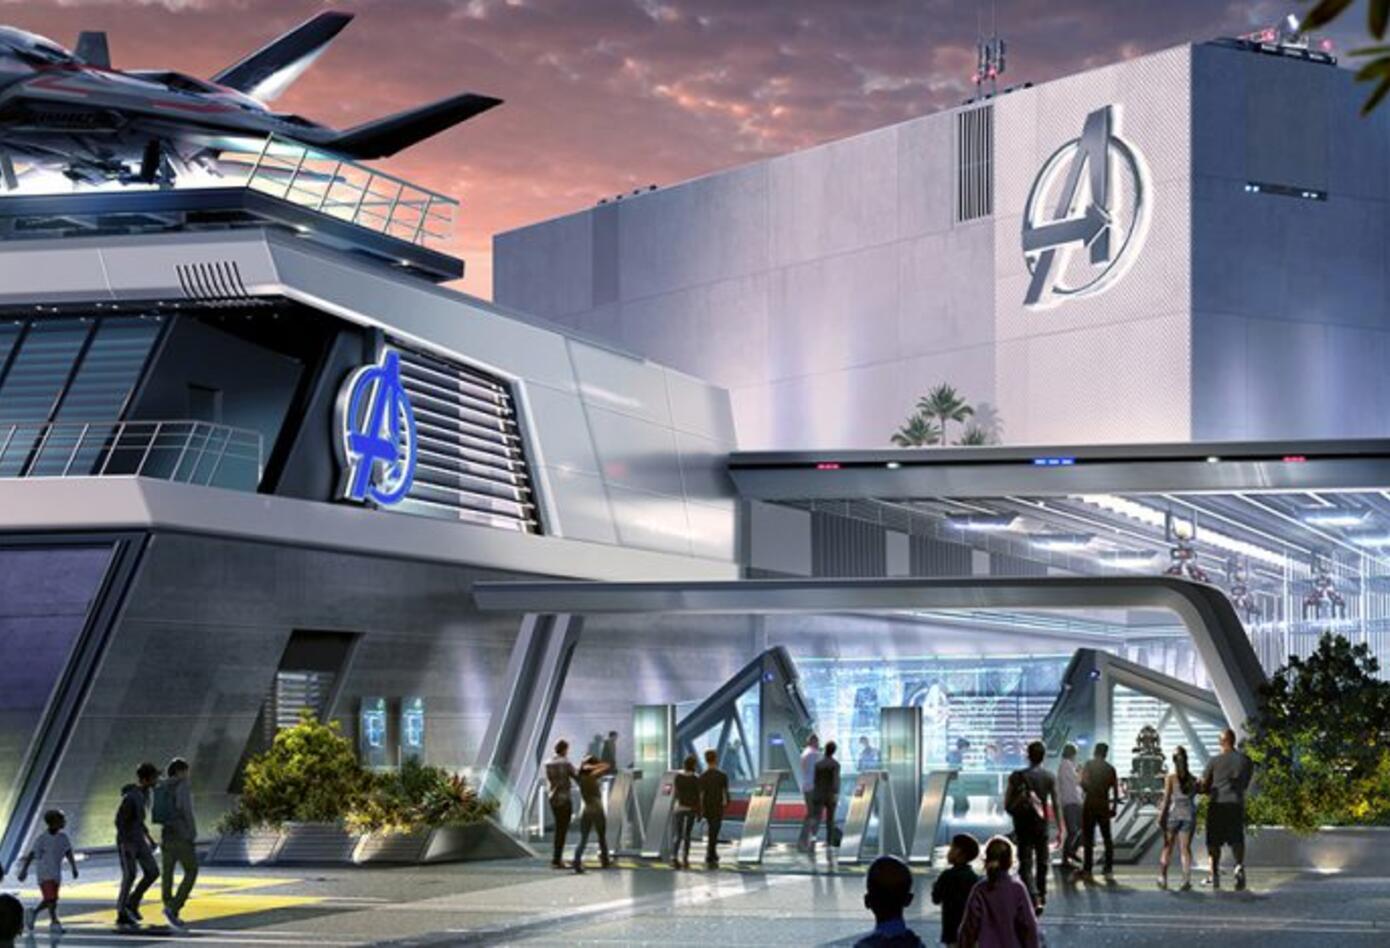 Campus Avengers